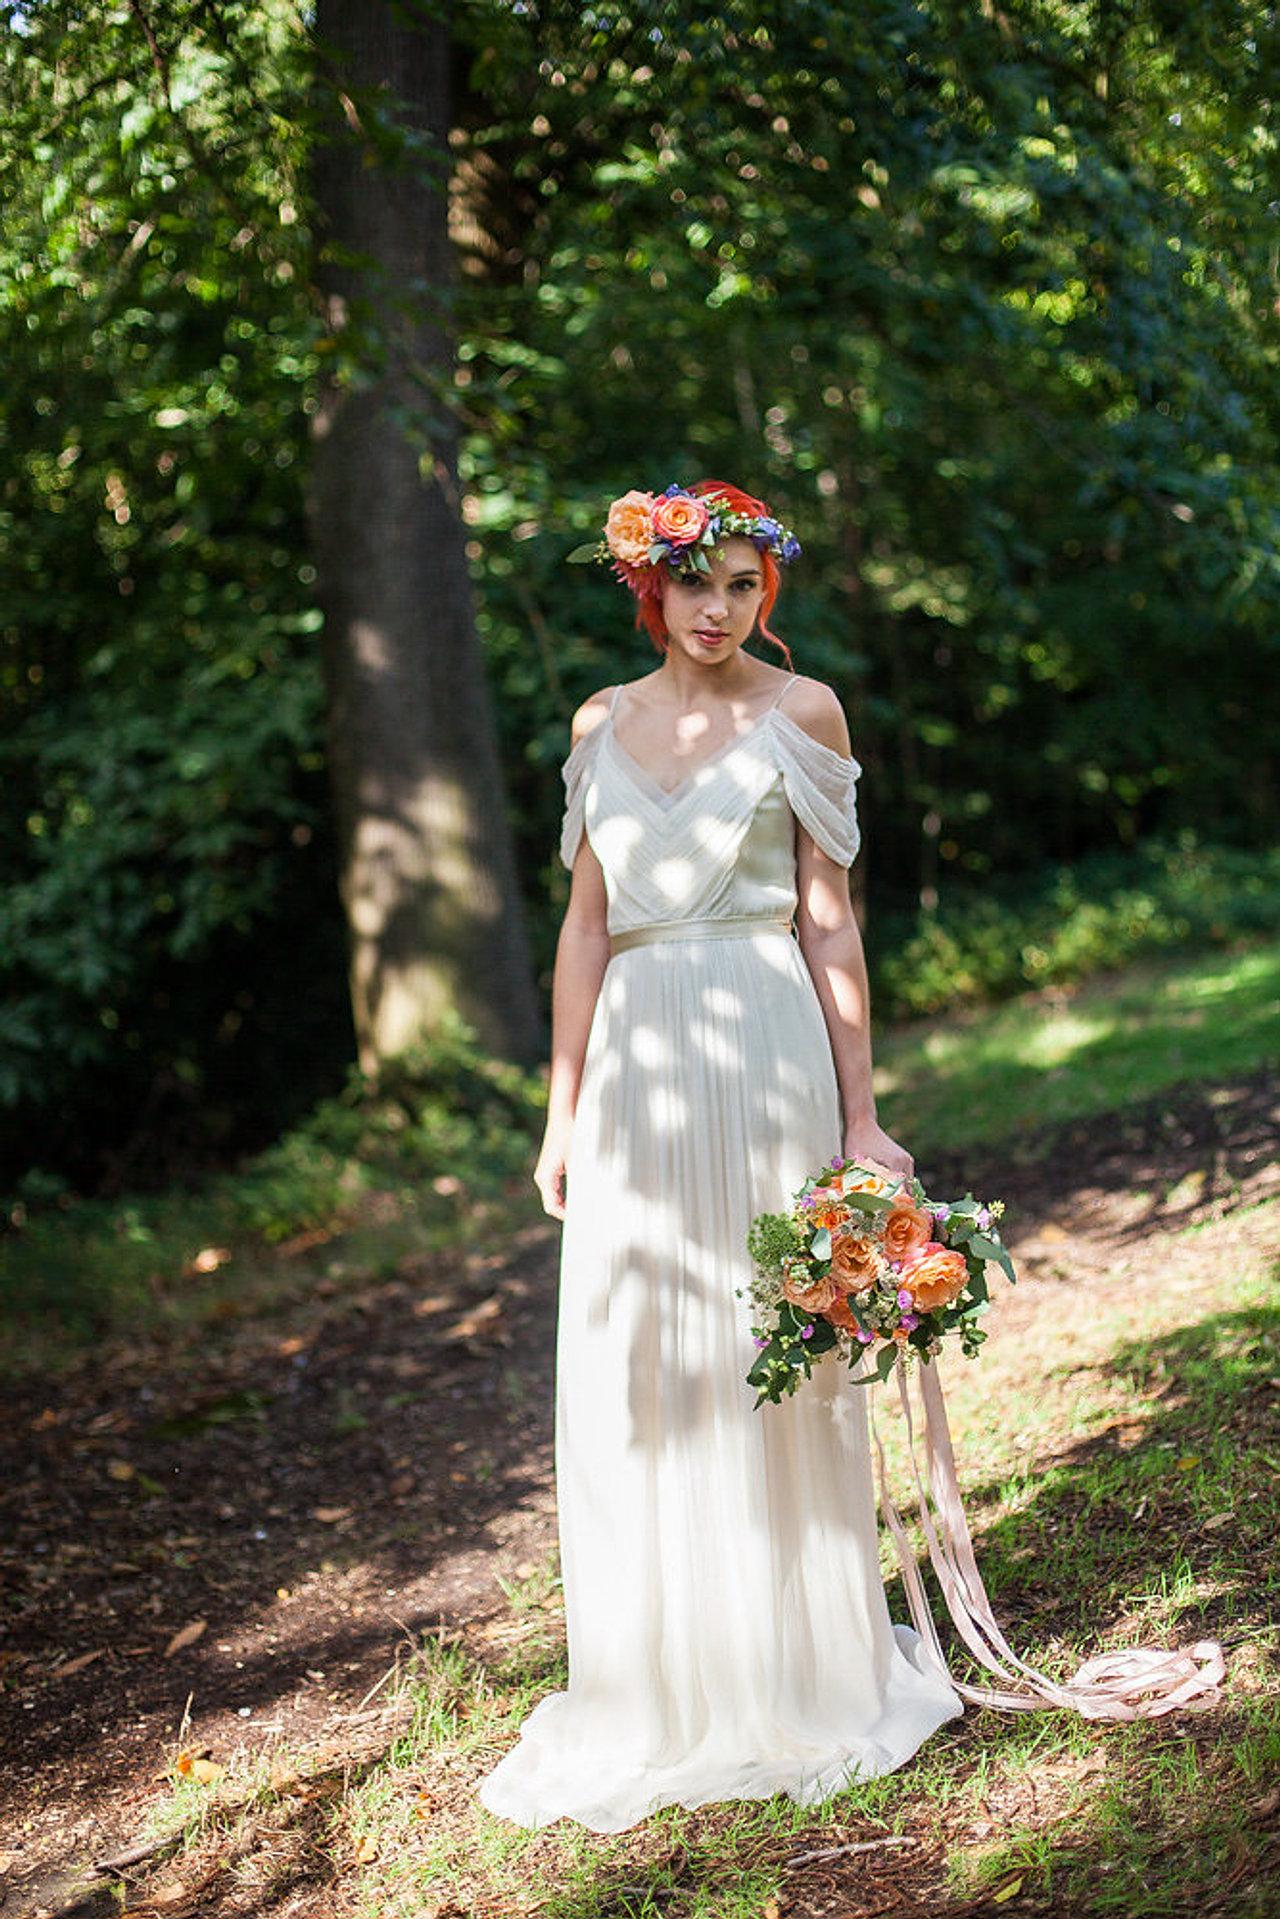 Rocker Wedding Dresses_Wedding Dresses_dressesss